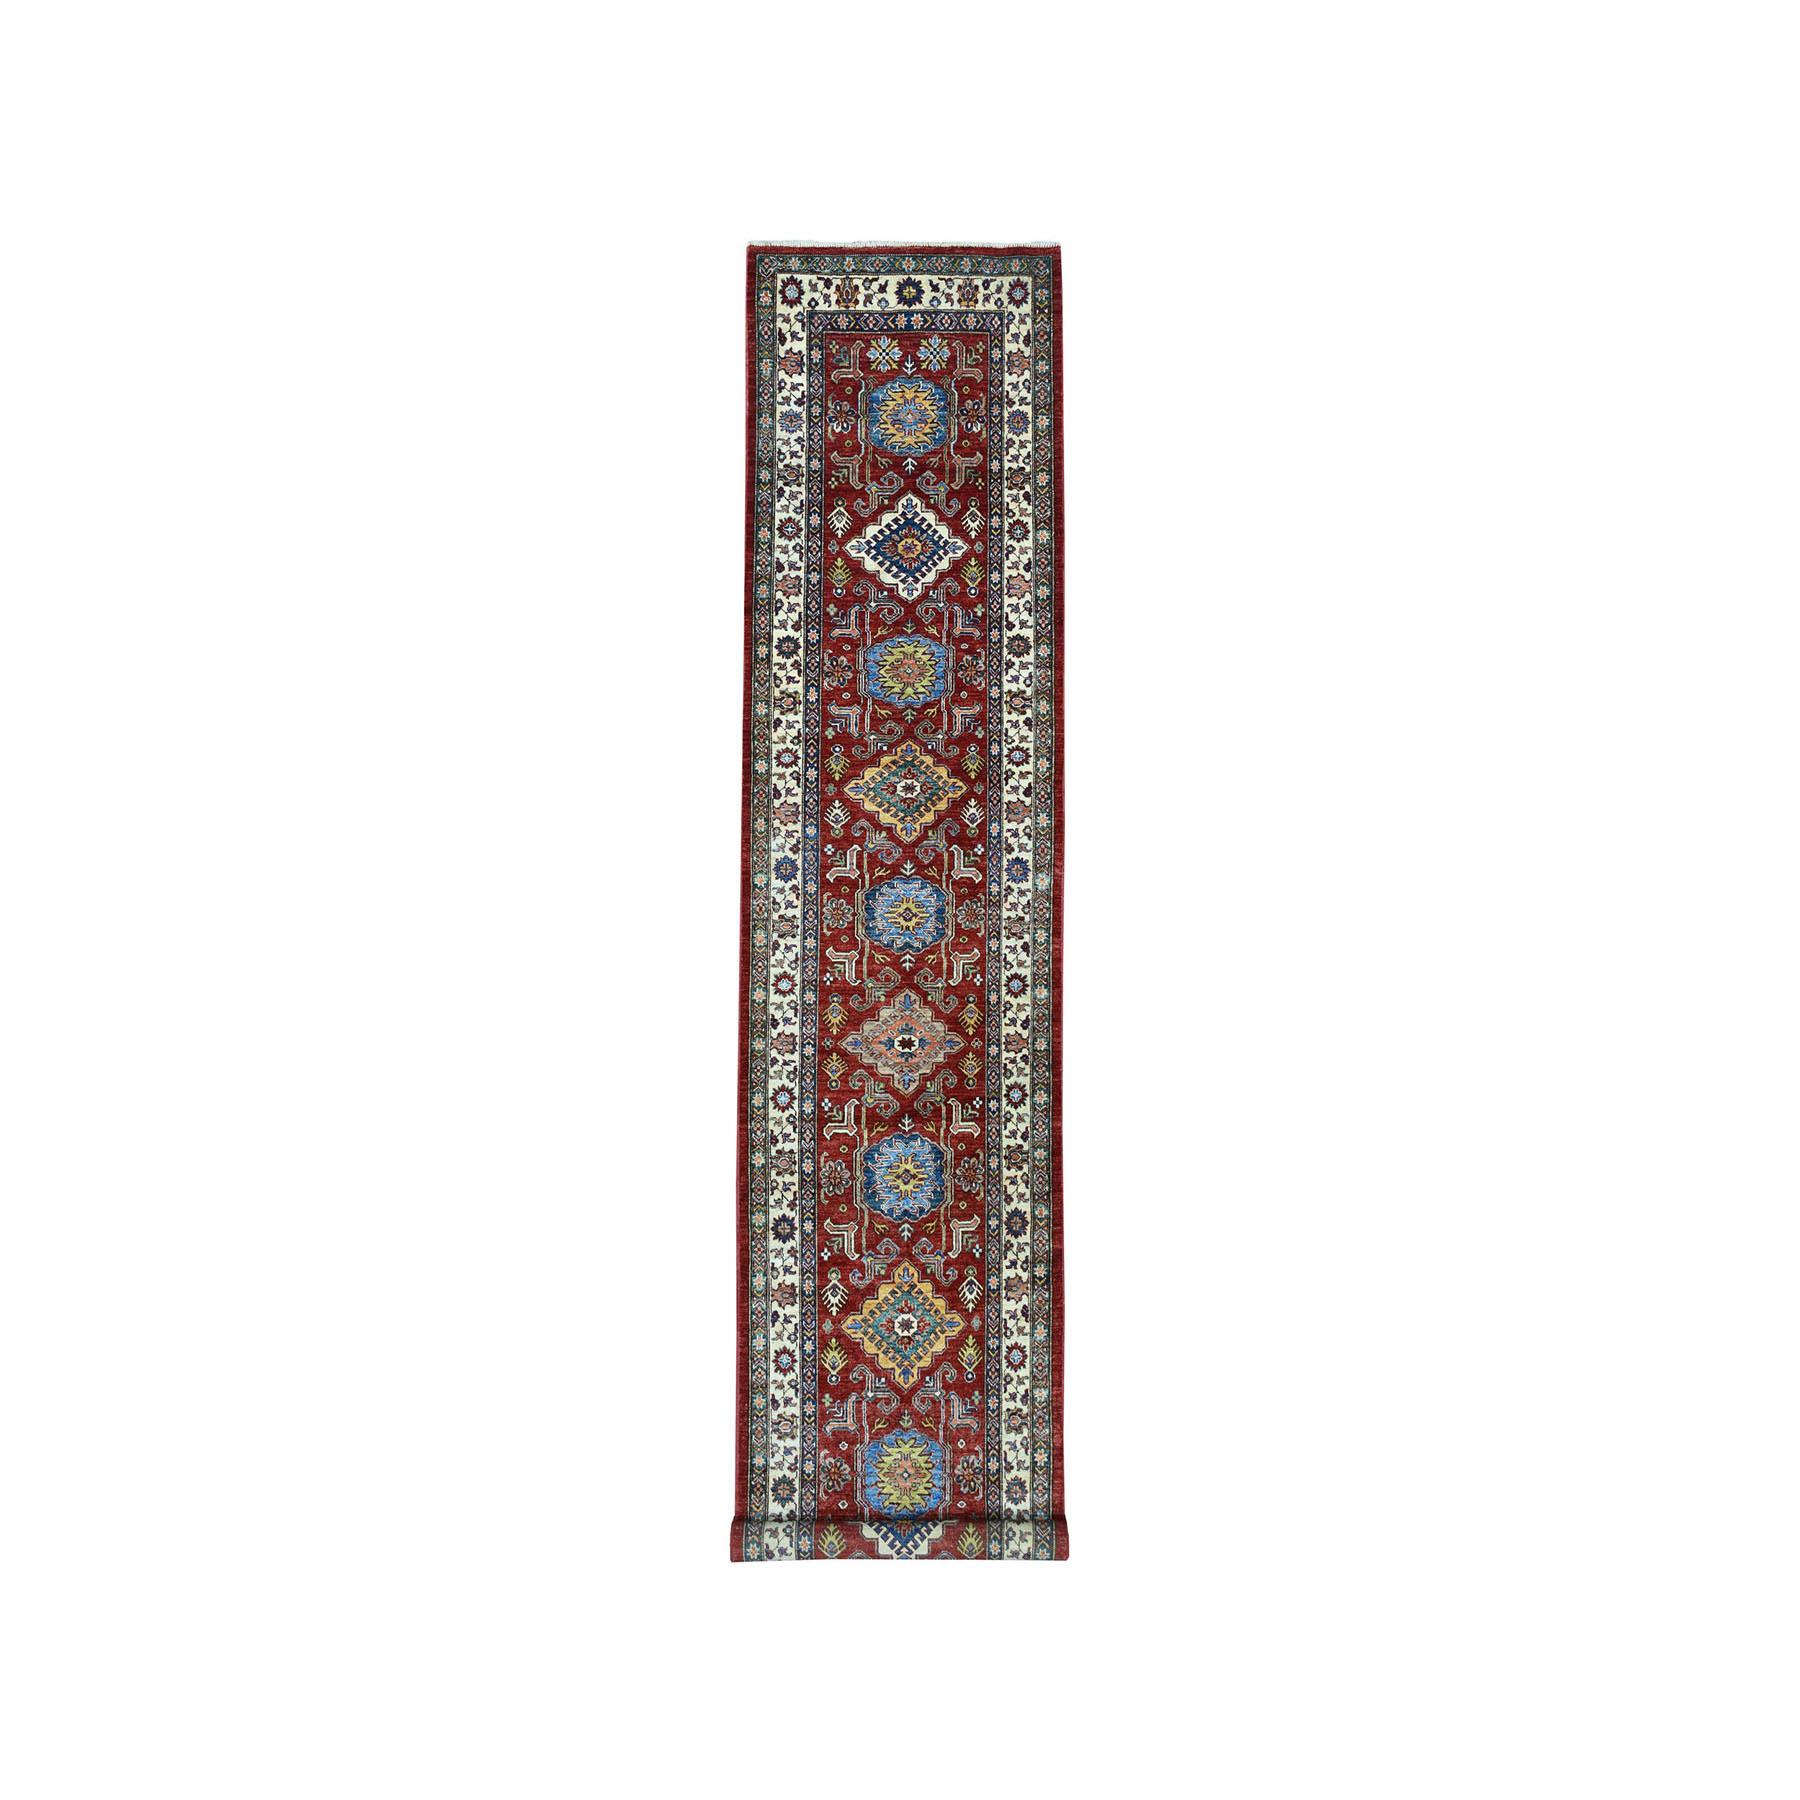 "3'4""X13'2"" Red Super Kazak Pure Wool Geometric Design Hand-Knotted Runner Oriental Rug moae08ba"